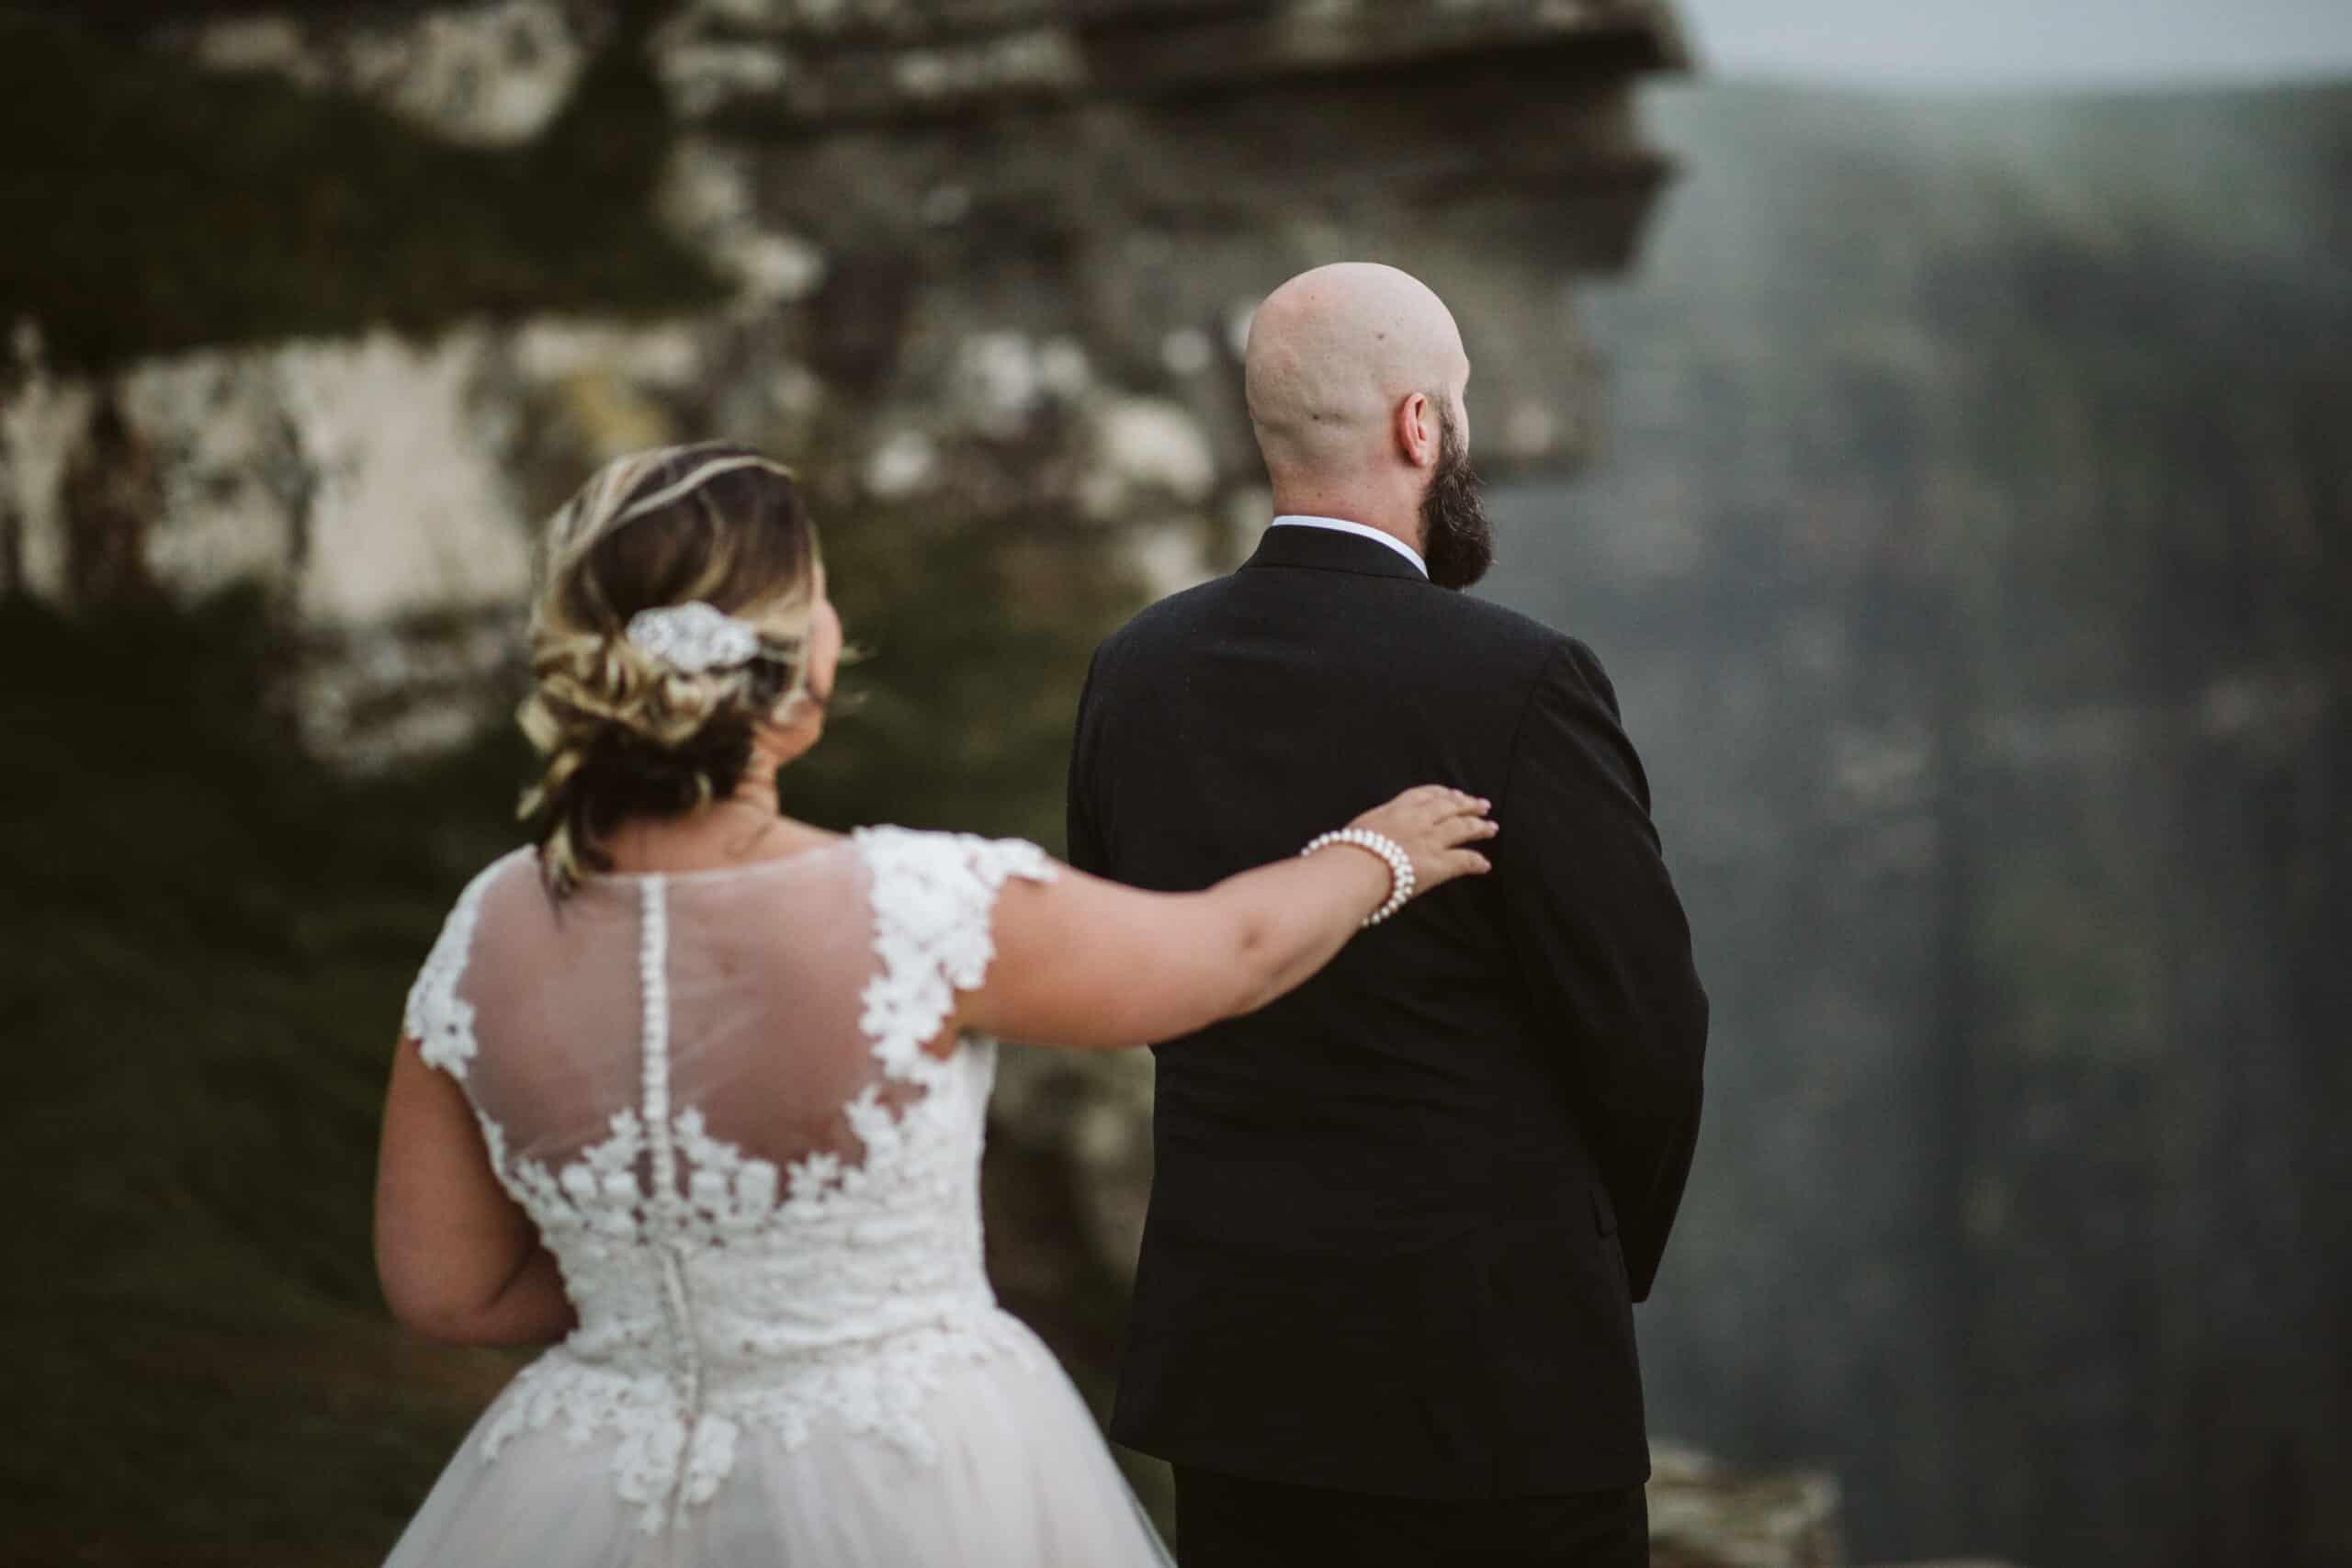 Cliffs of Moher Wedding Hags head, bride taps groom on the shoulder